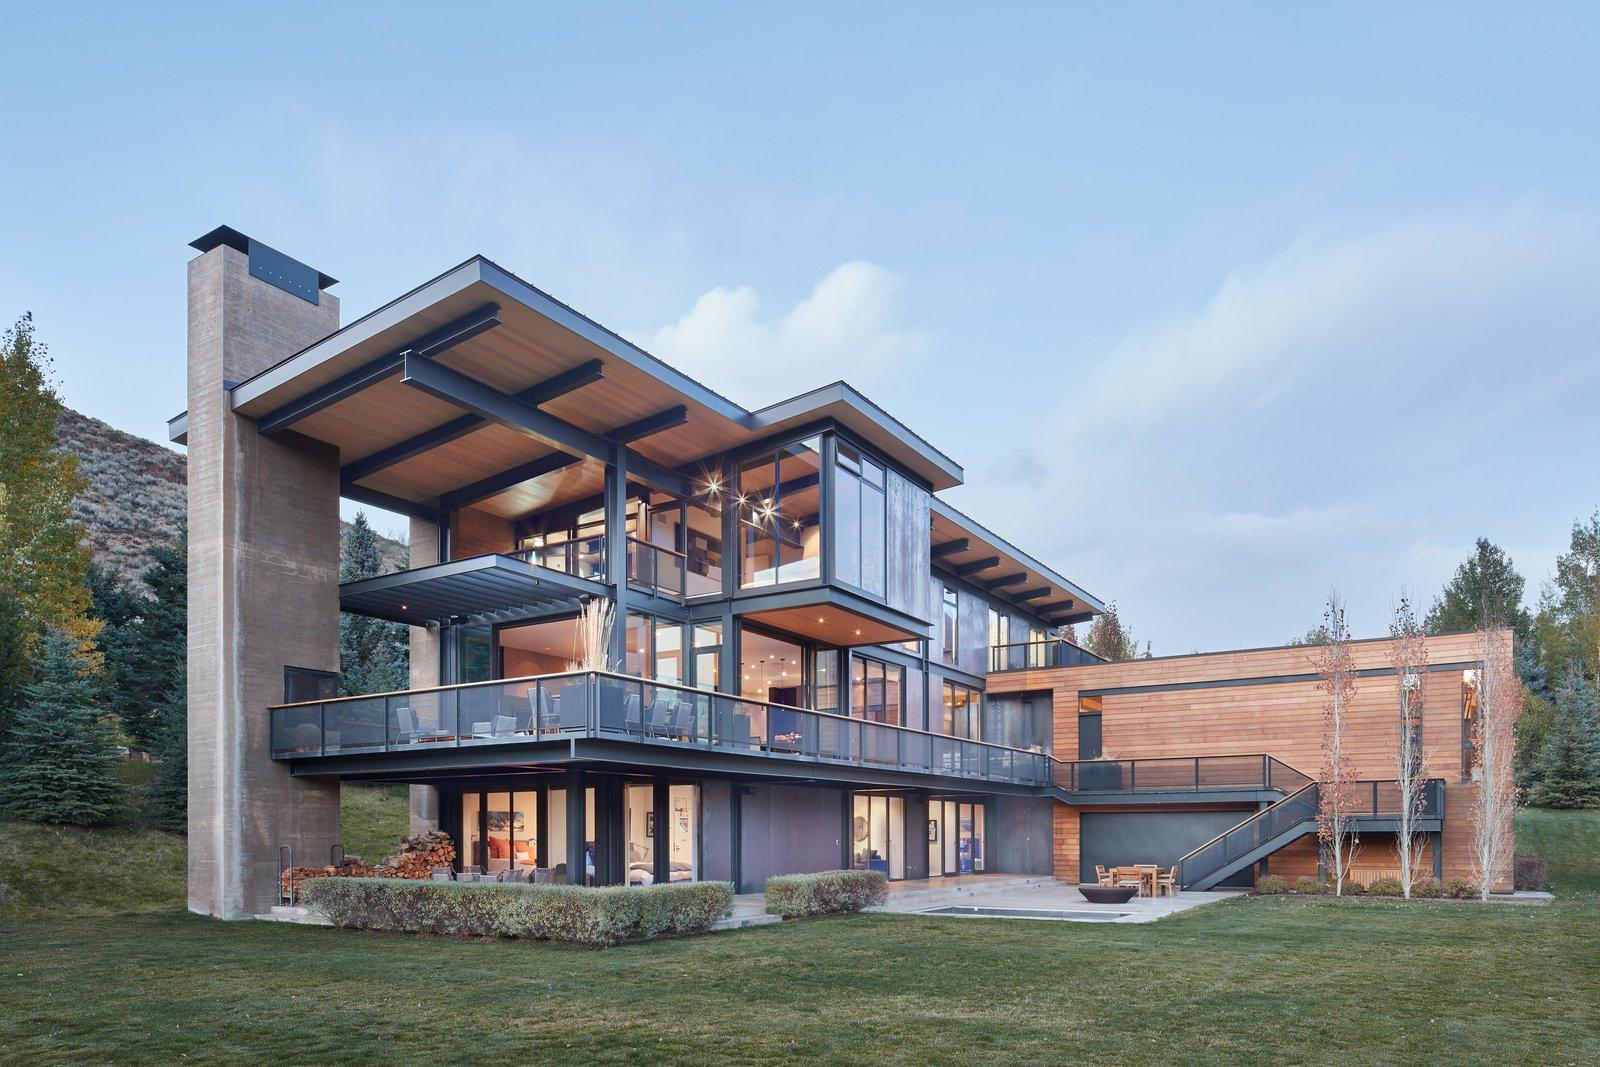 Lake Creek Residence Modern Home in Ketchum Idaho by